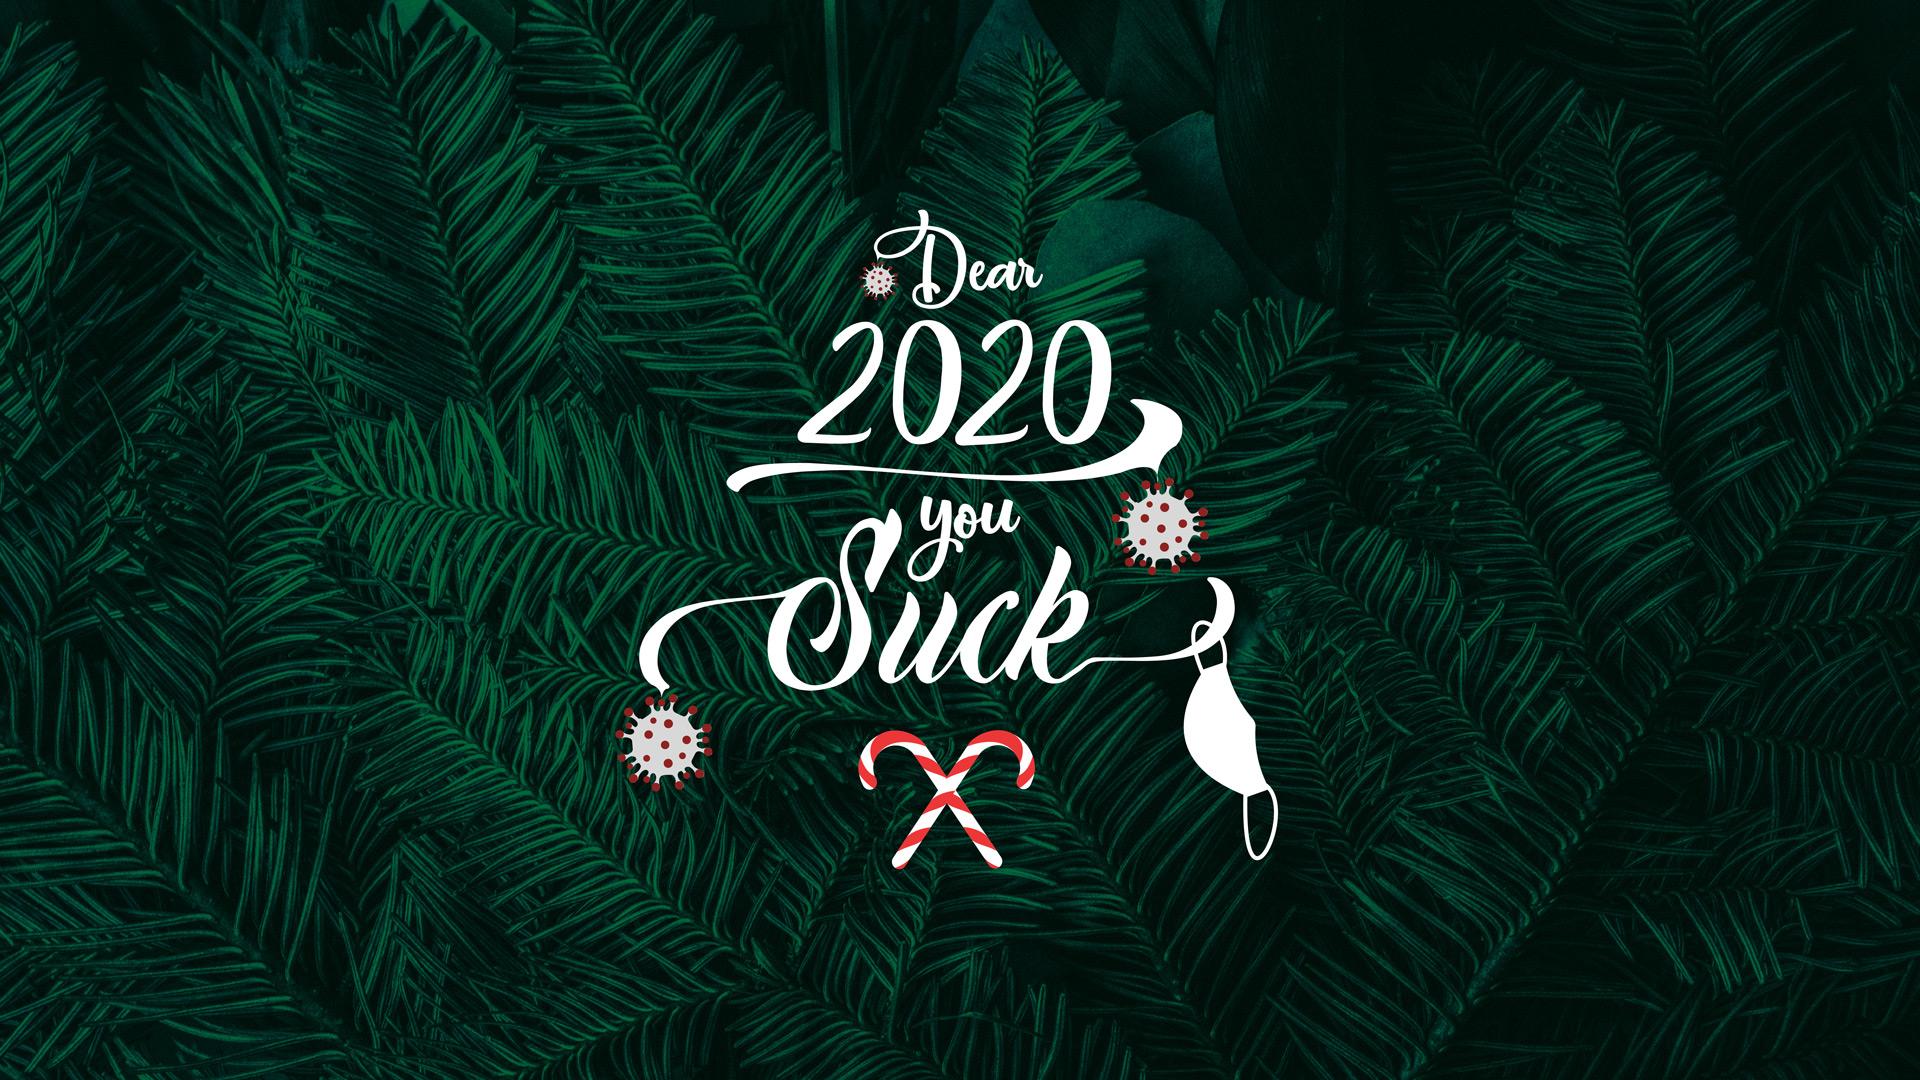 December 2020 wallpaper desktop